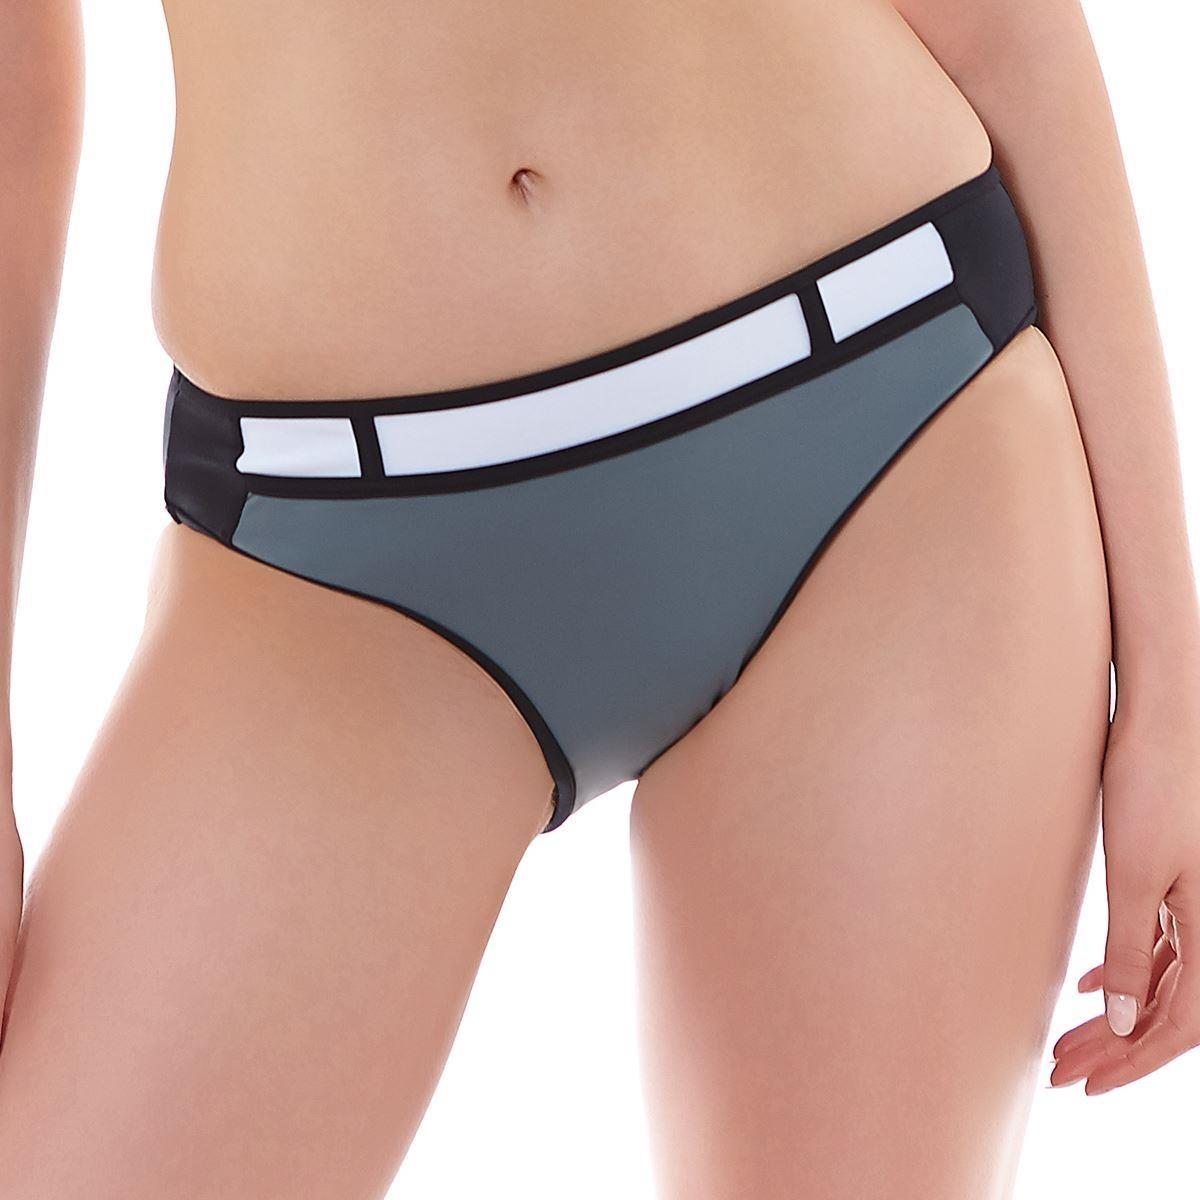 Freya Swimwear Bondi Hipster Bikini Brief/Bottoms - Black